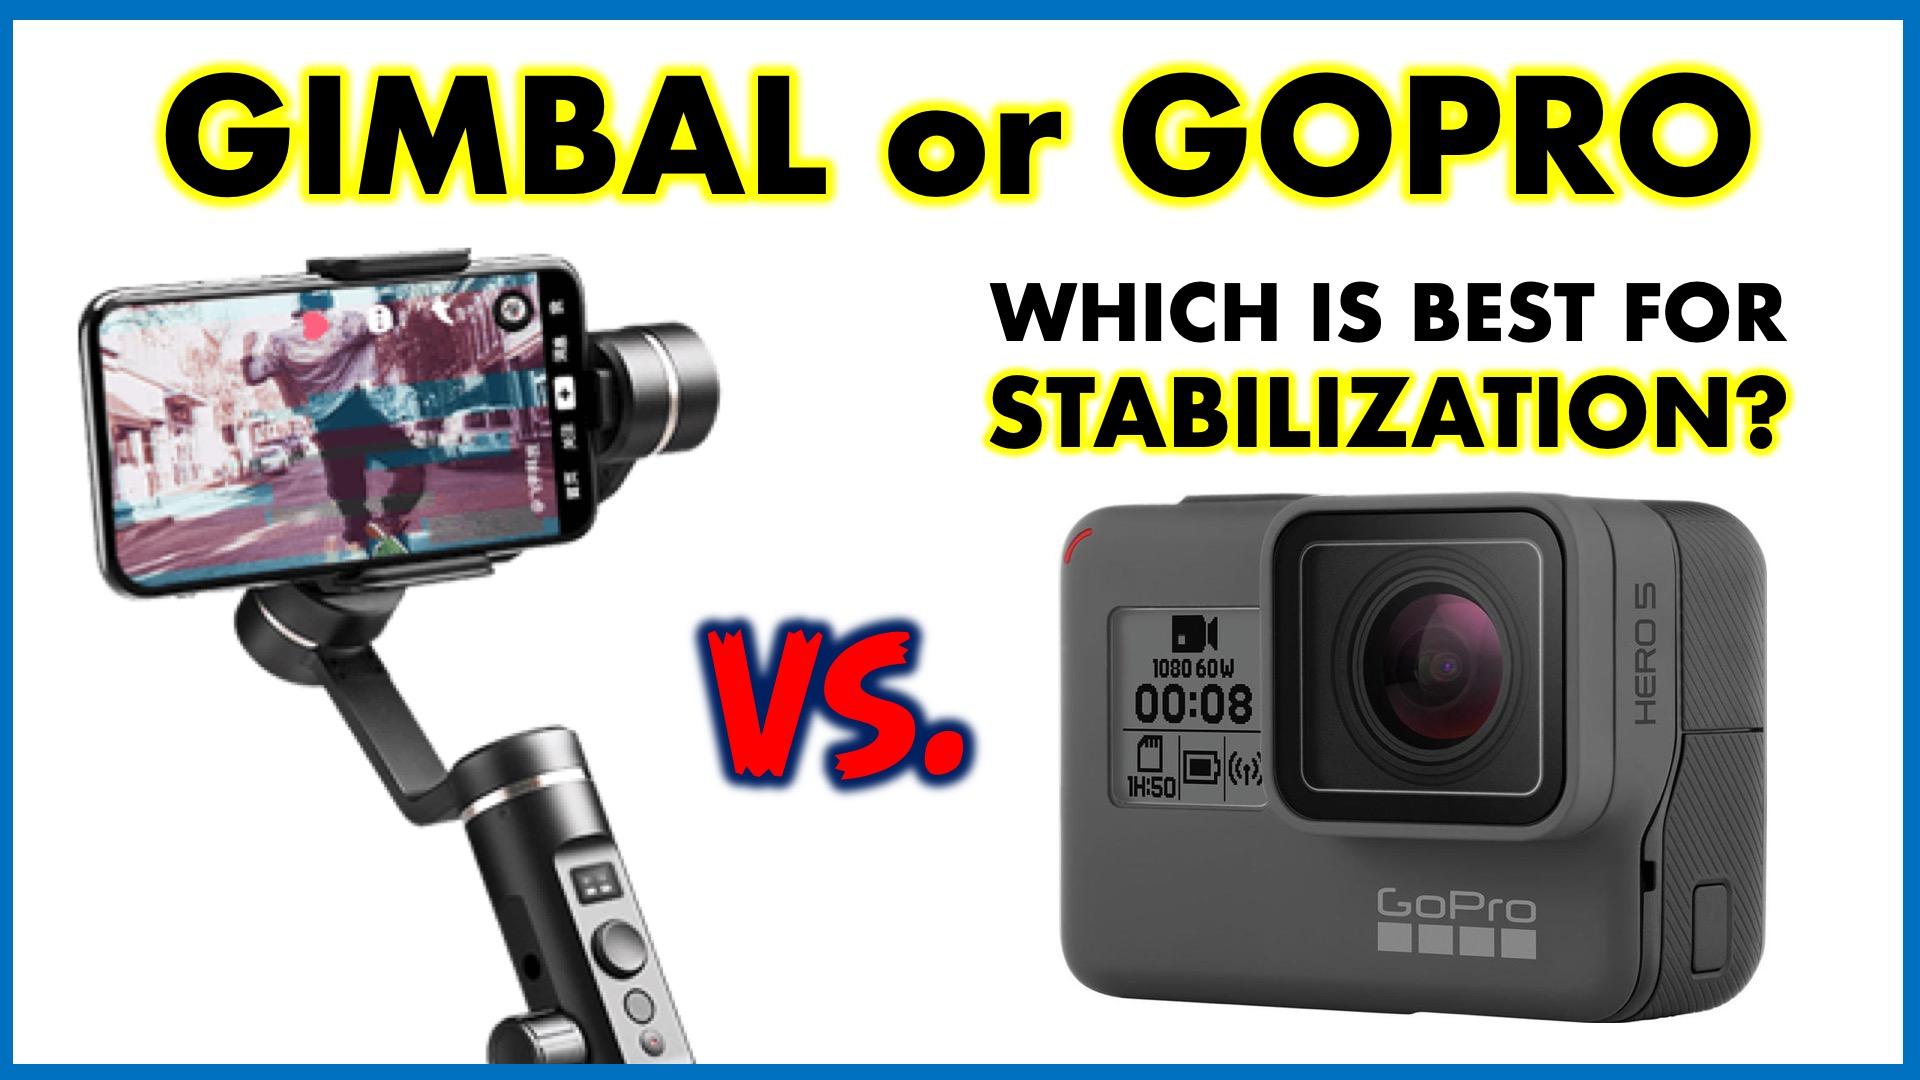 Gimbal vs. GoPro